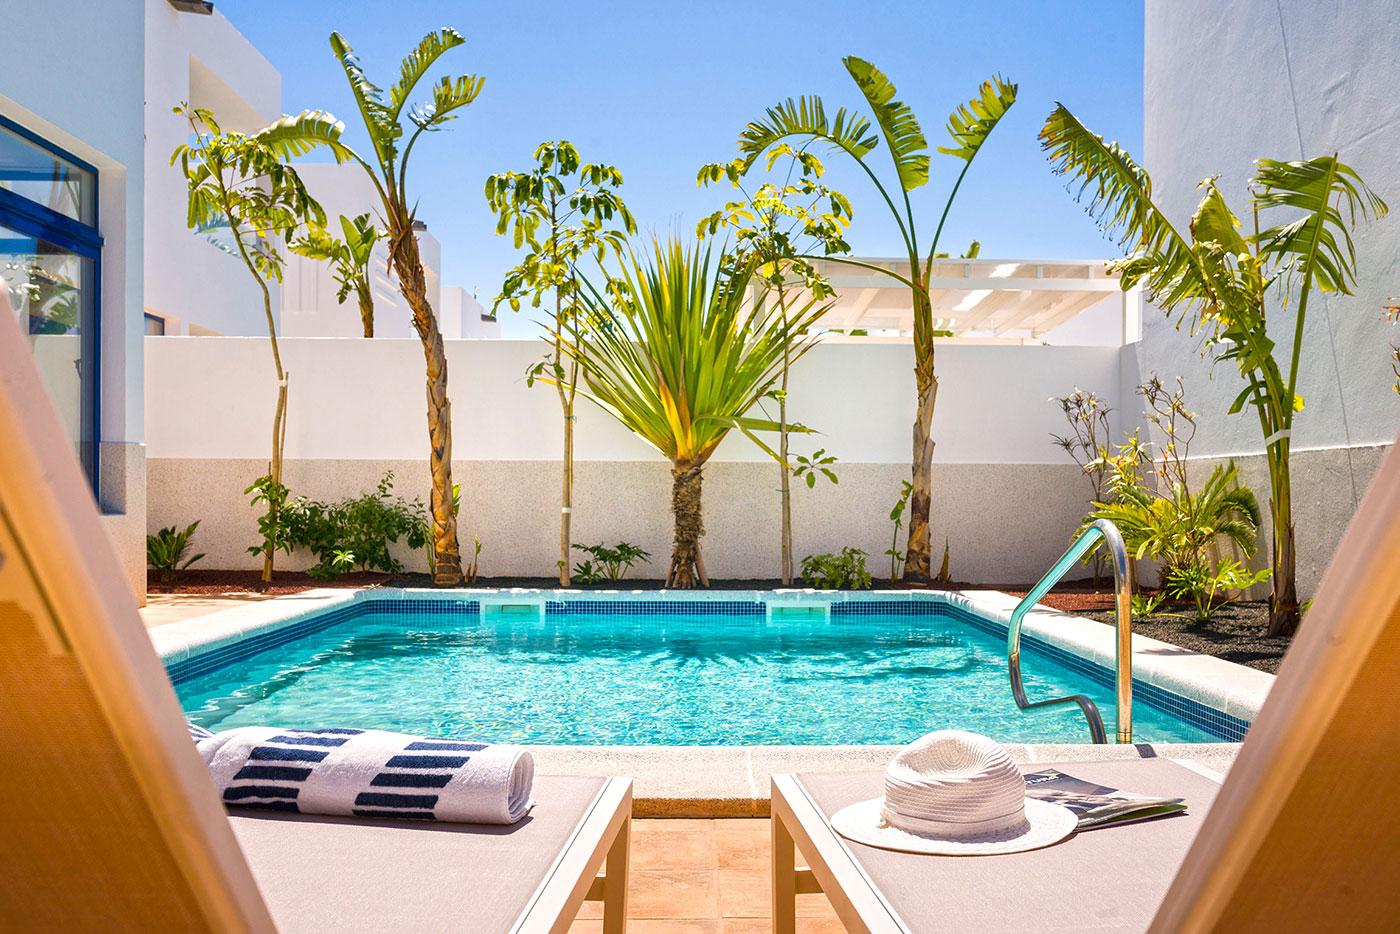 villas-de-la-marina-luxury-relaxation_5